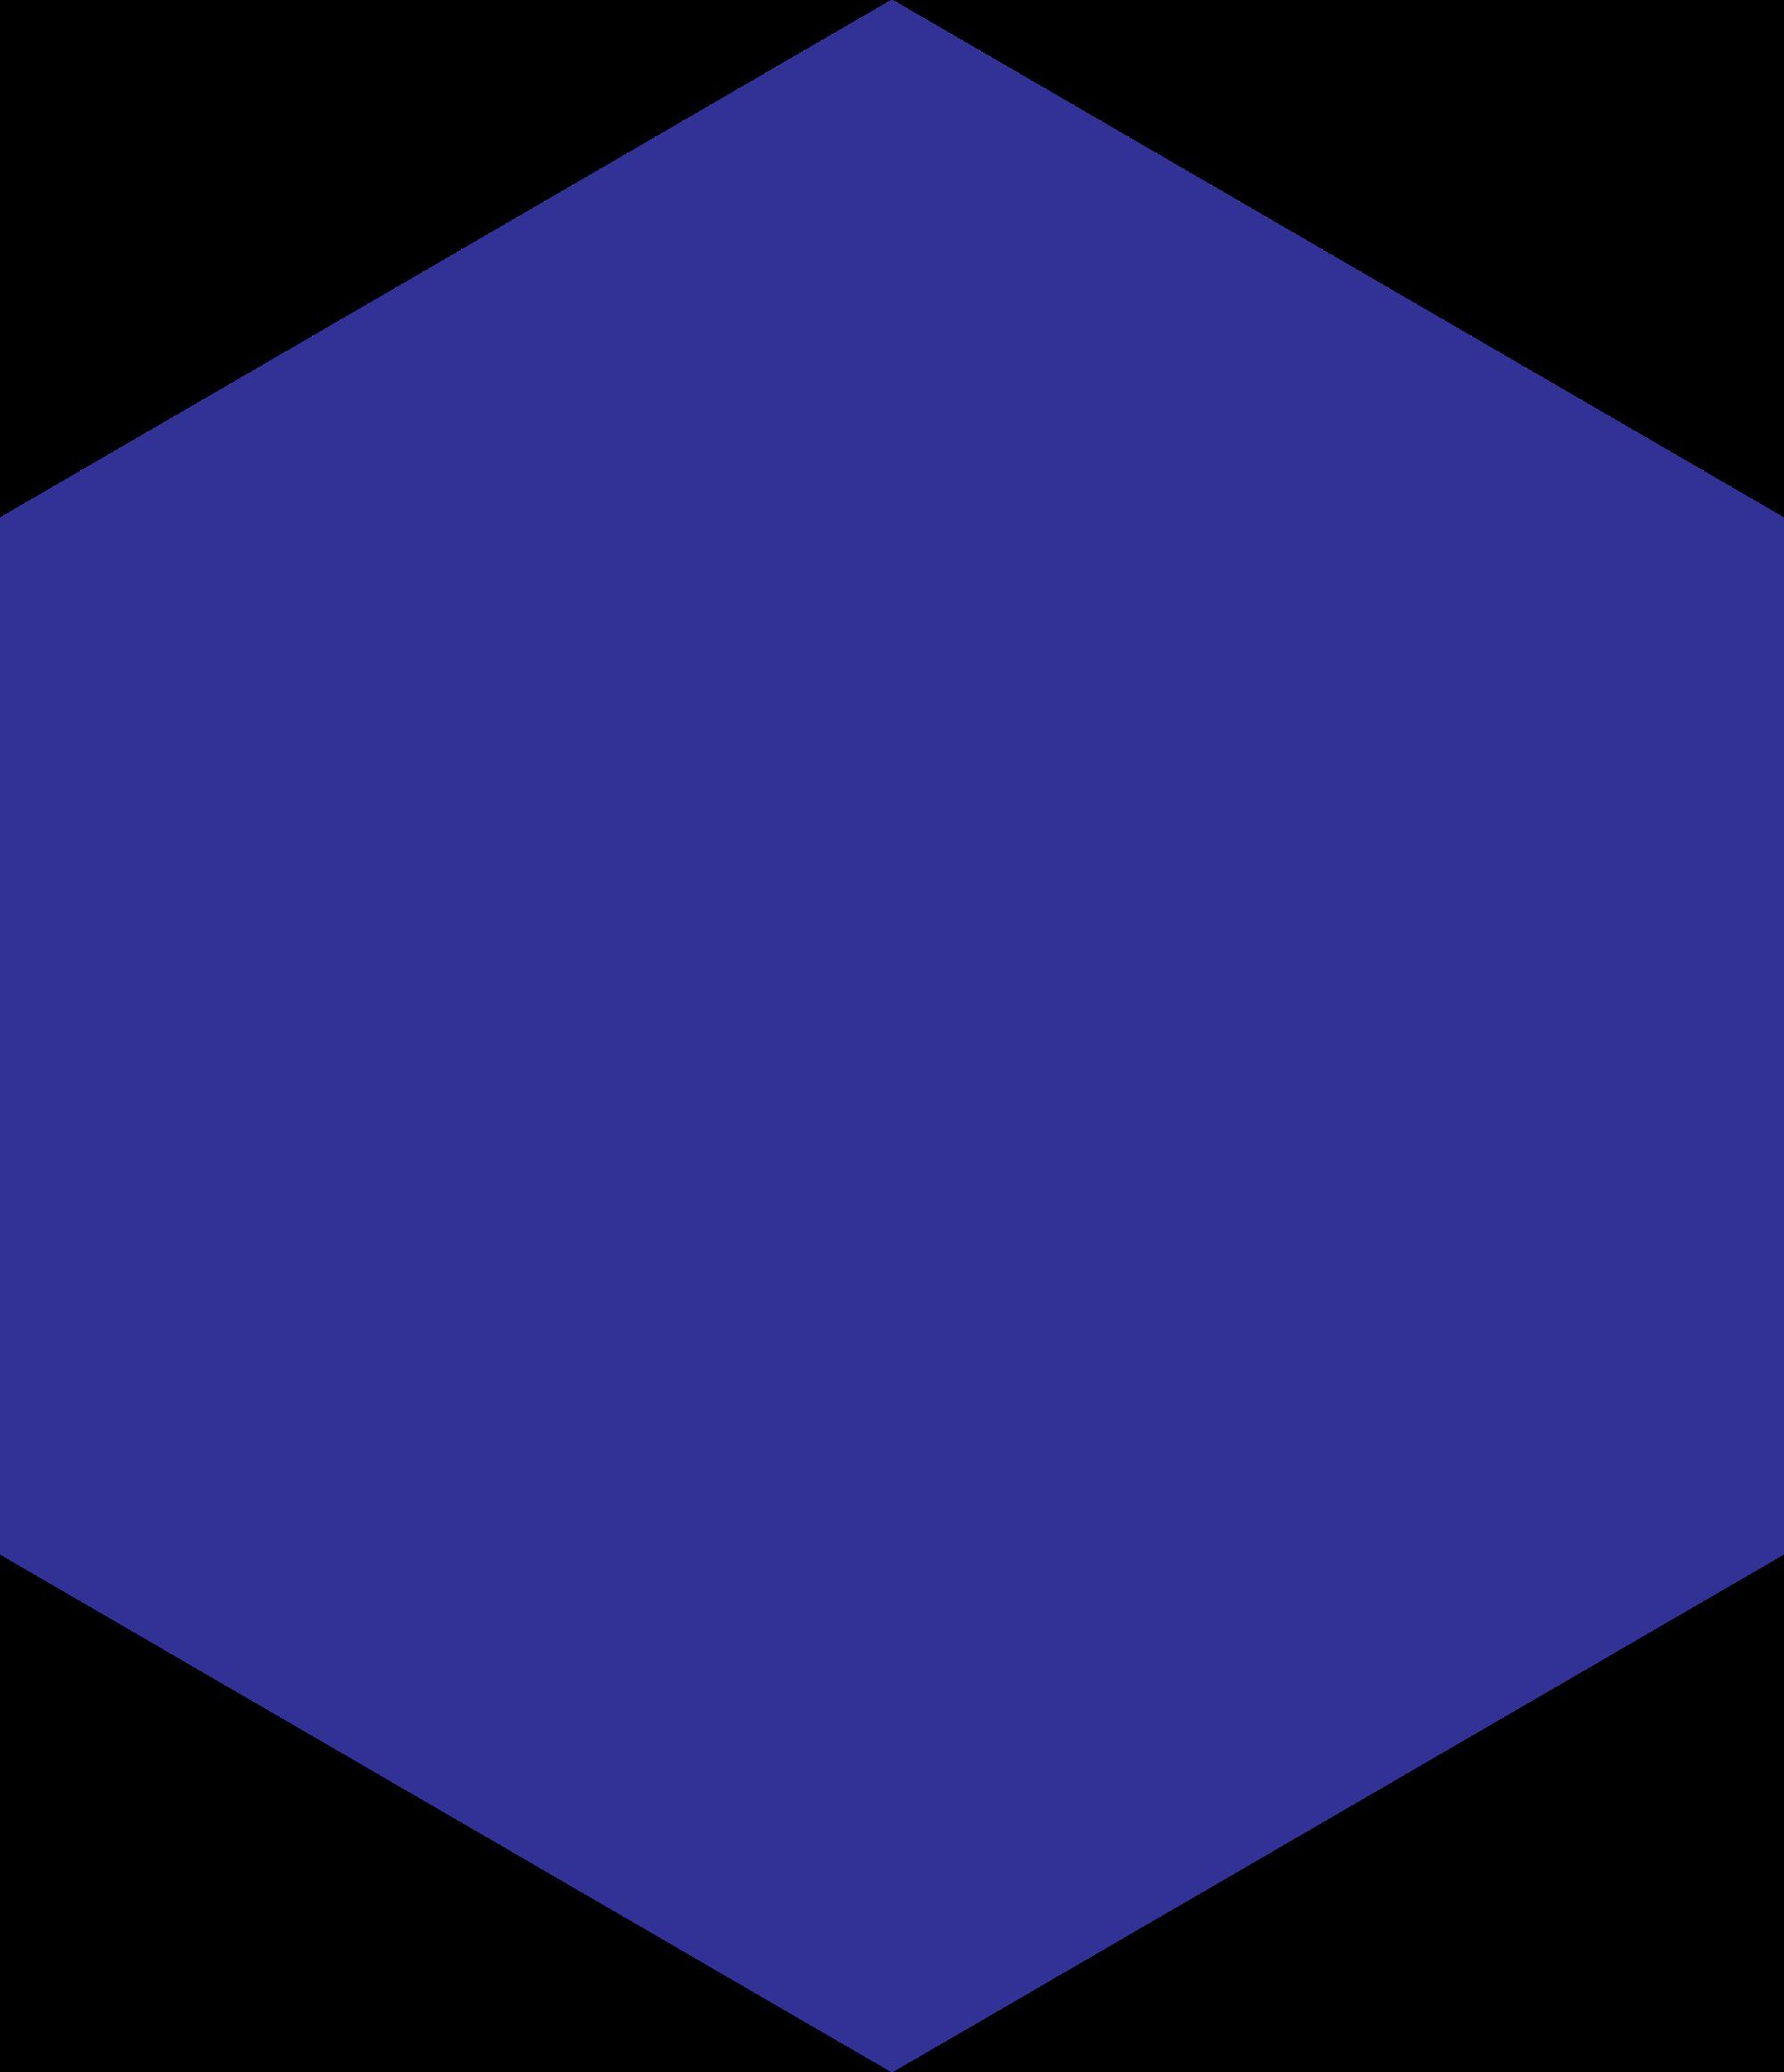 Open Hdpng.com  - Hexagon Shape, Transparent background PNG HD thumbnail